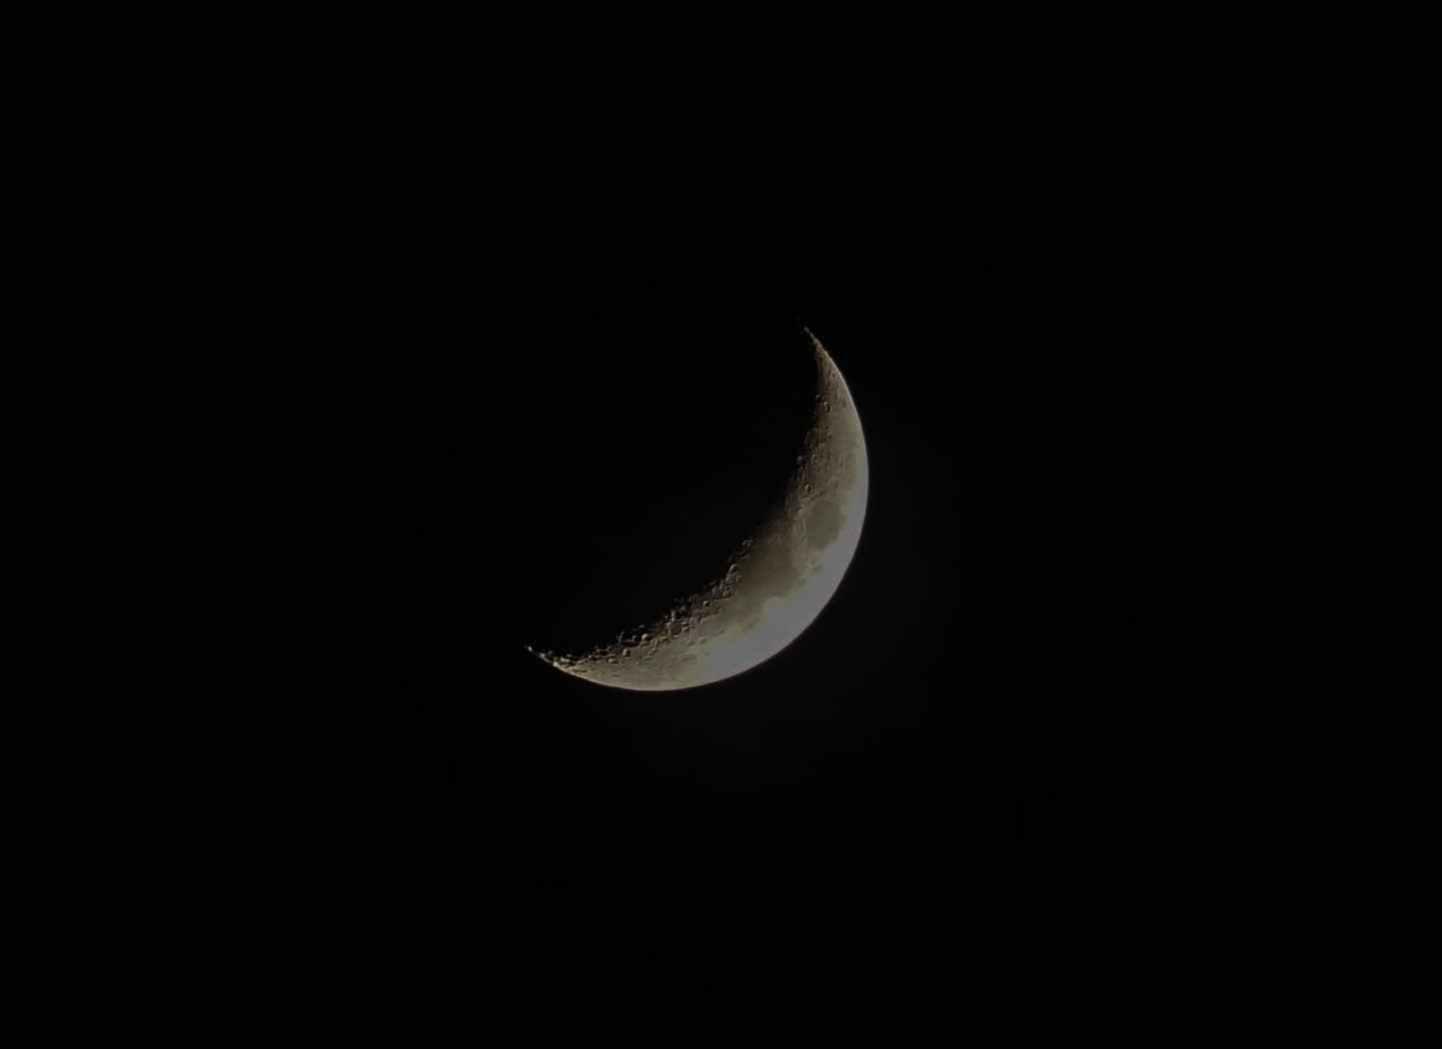 night dark moon slice